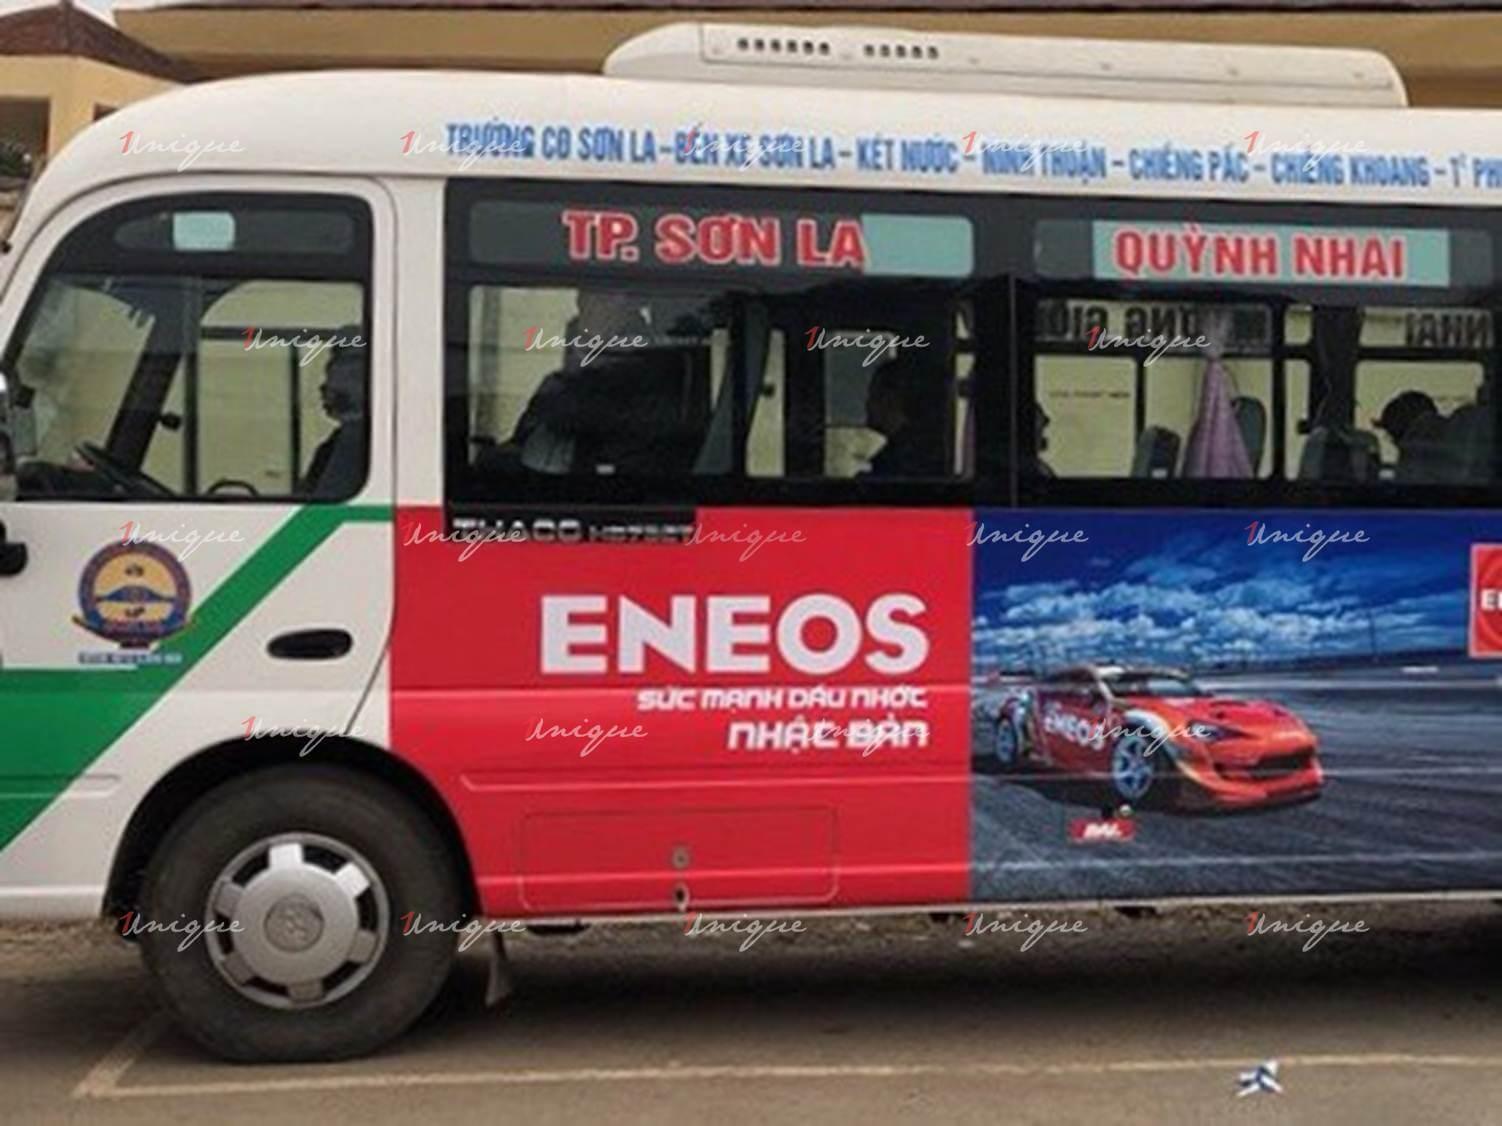 quảng cáo xe bus tại sơn la